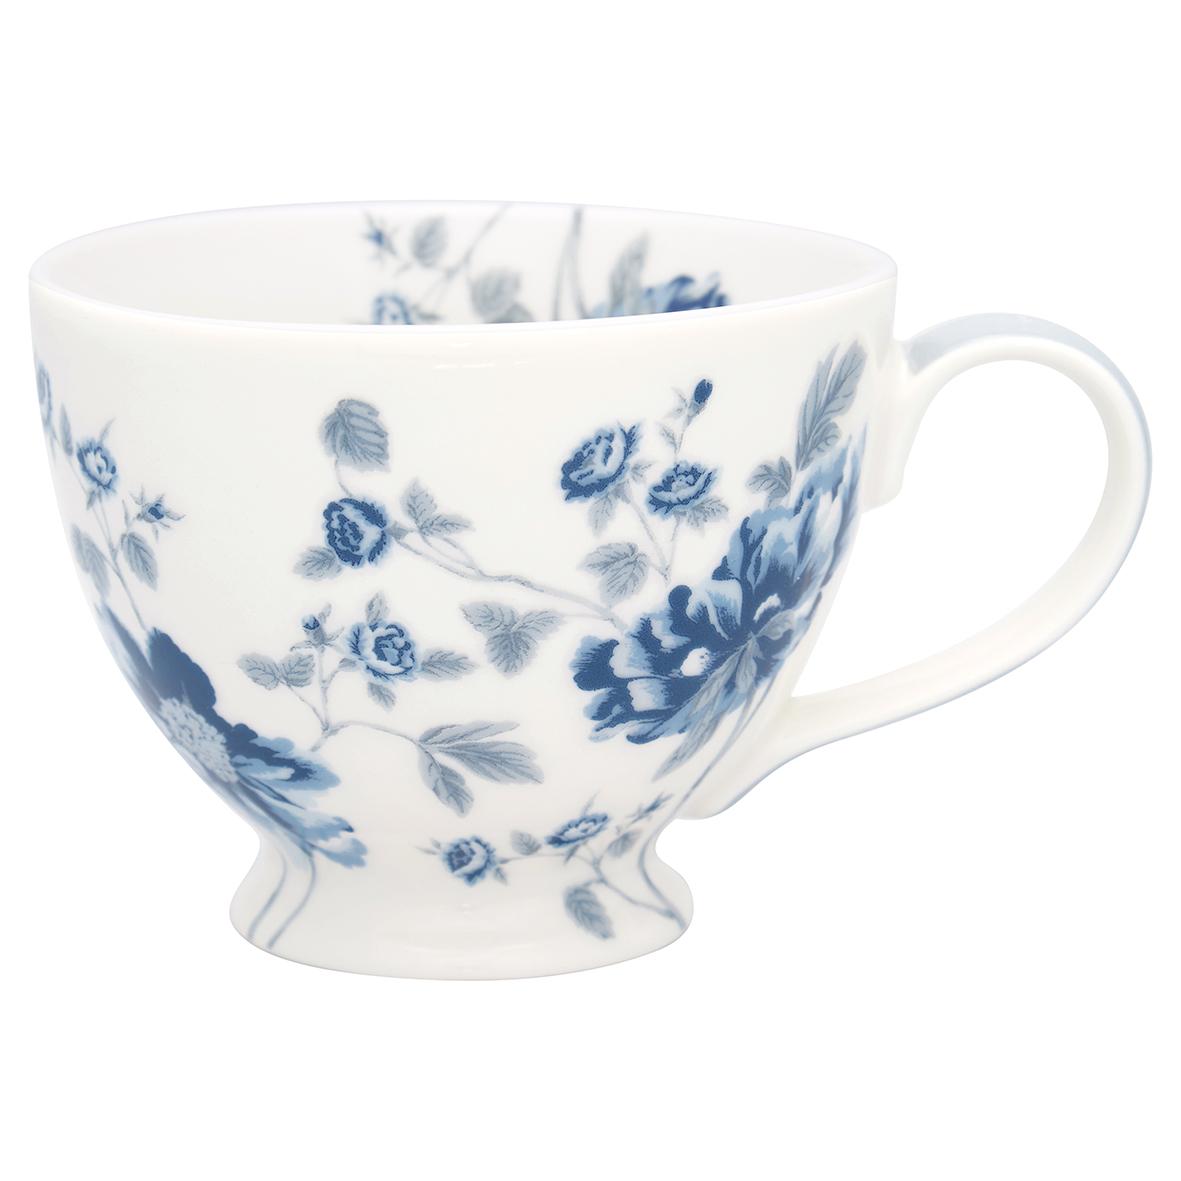 Greengate Teacup Charlotte white